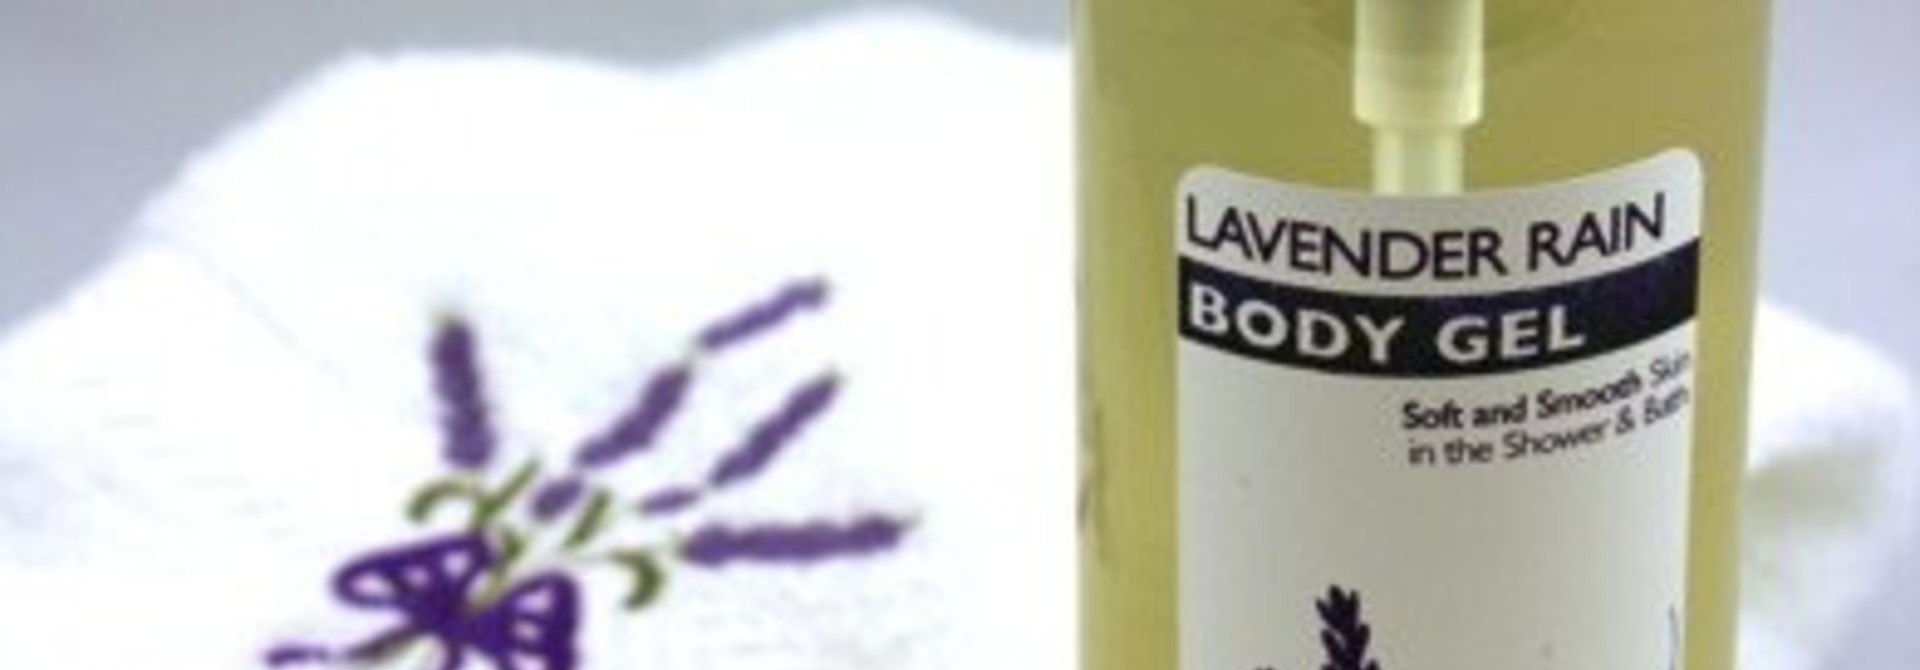 Lavender Rain Body Gel